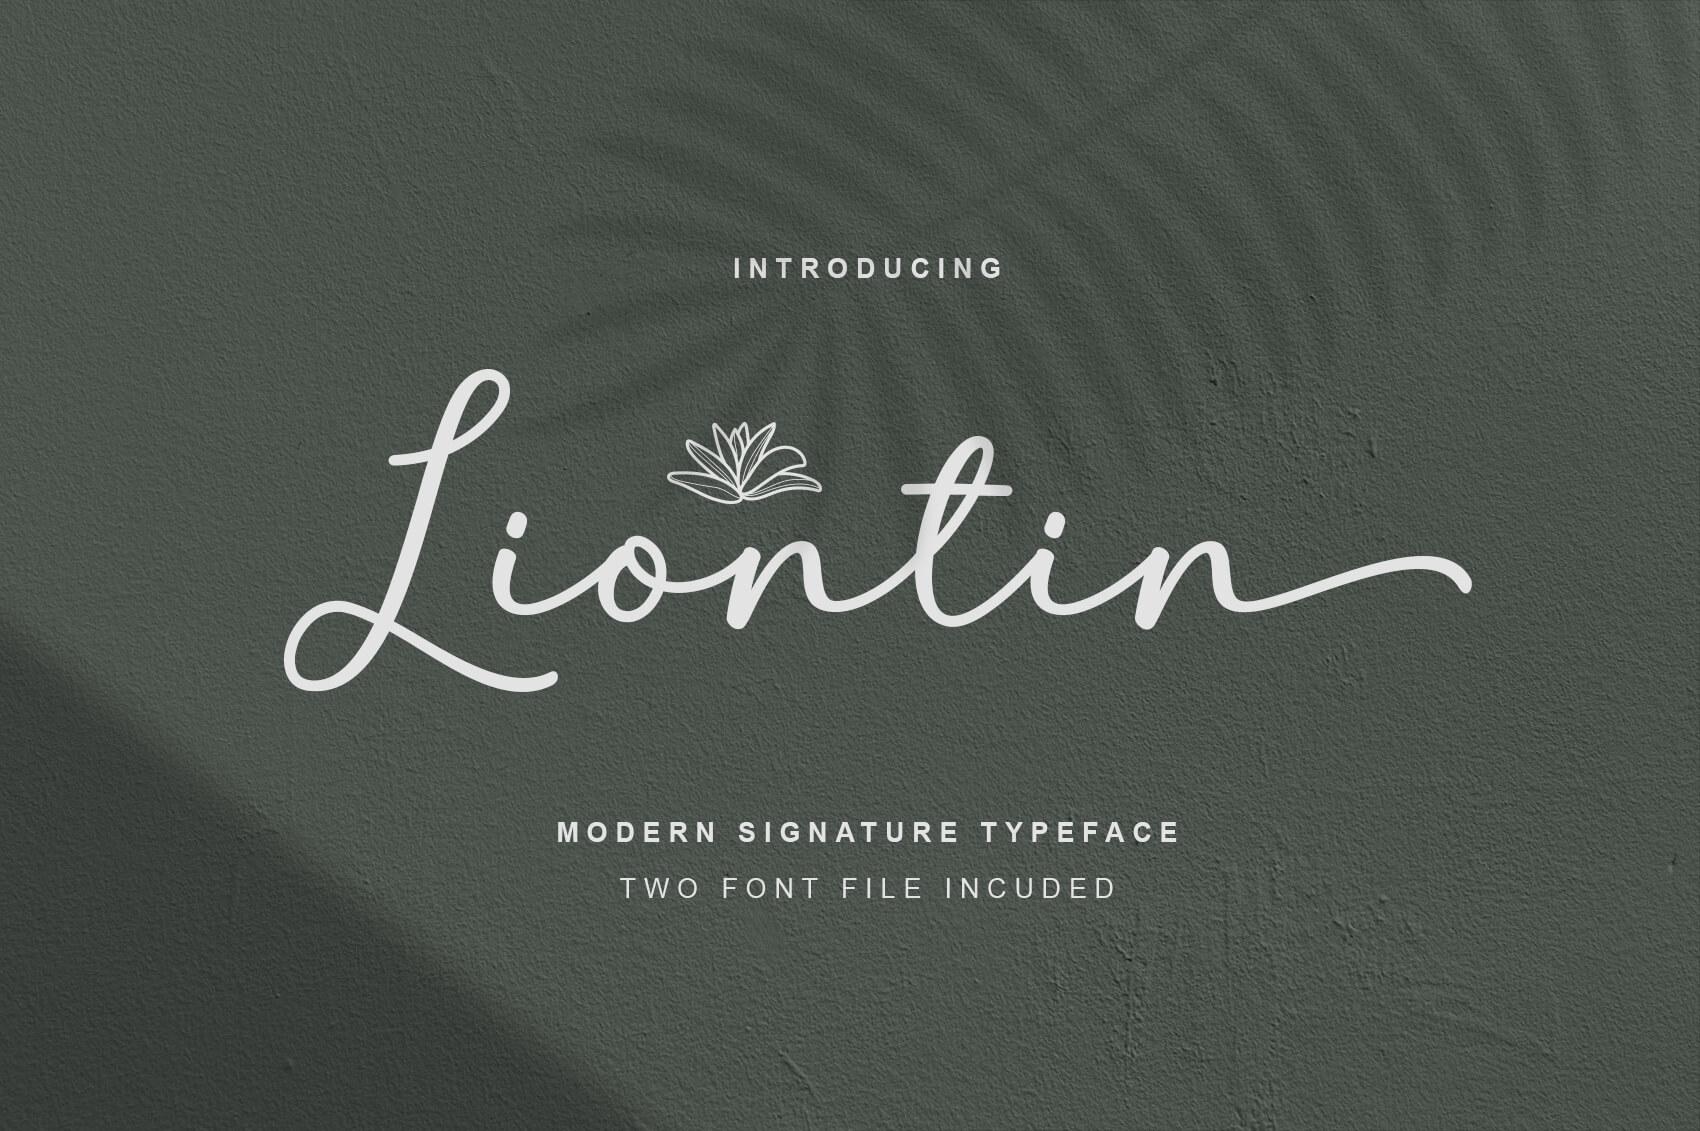 Liontin